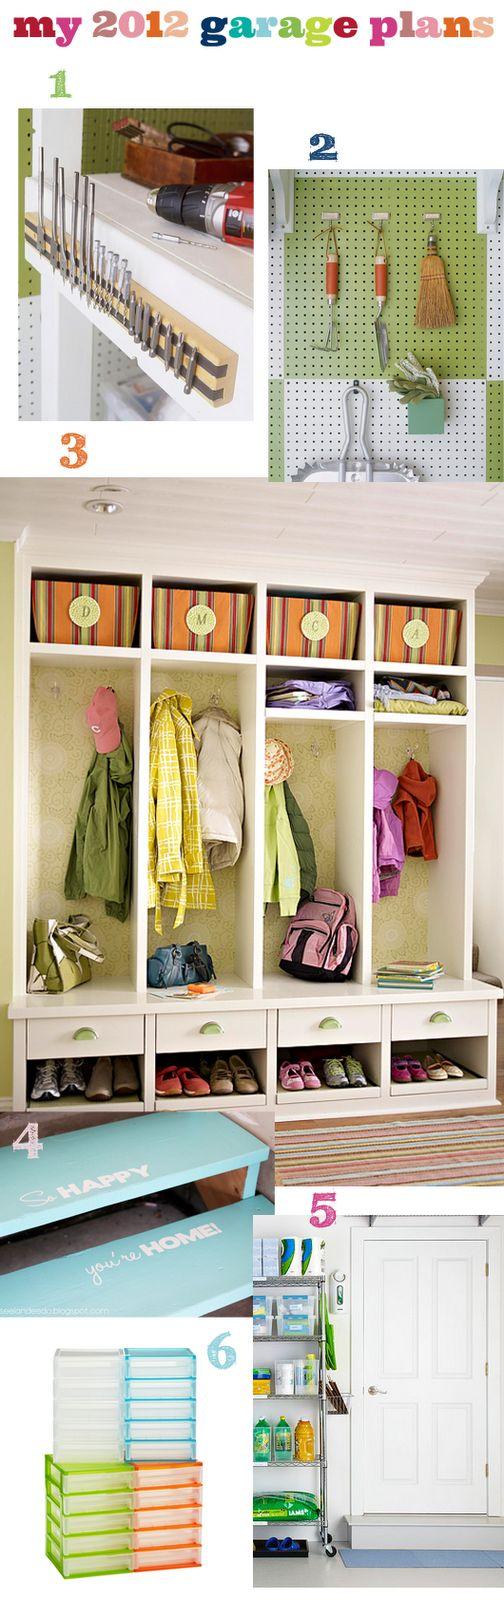 Garage: Organizations Ideas, Mudrooms, Mud Rooms, Garage, Laundry Rooms, Rooms Ideas, Diy Projects, Cubbie, Kid